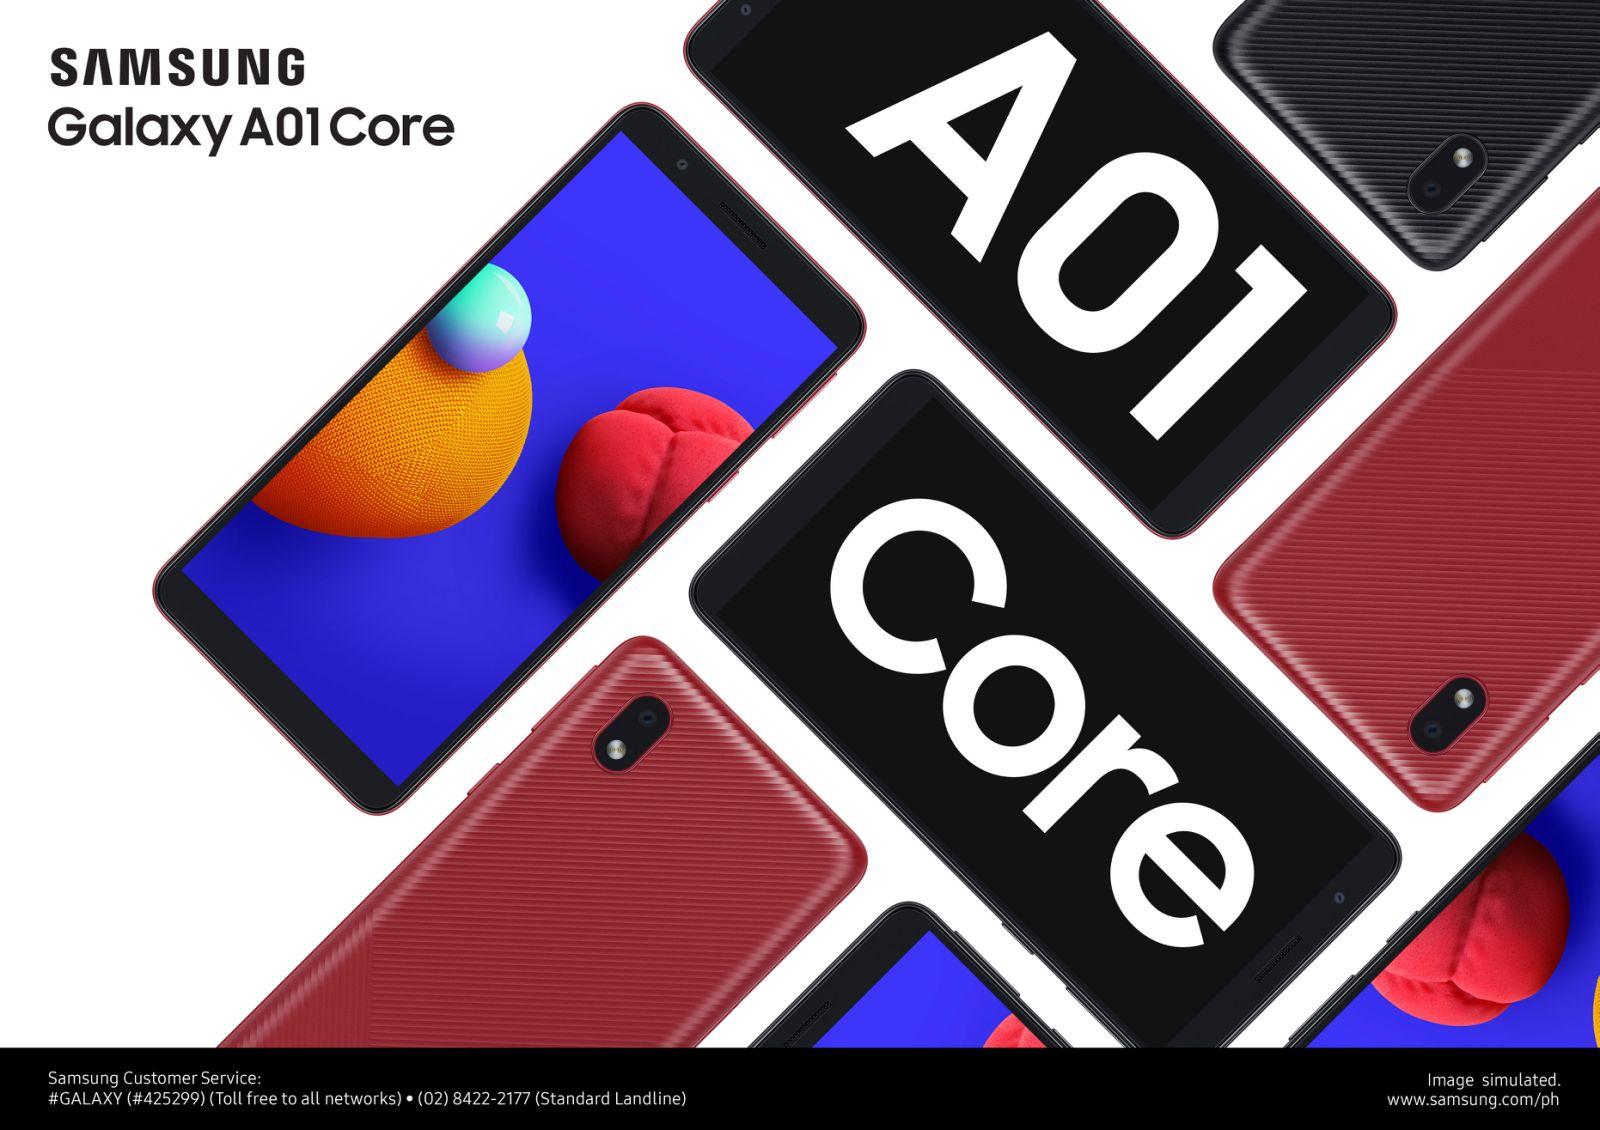 Samsung Galaxy A01 Core Specs